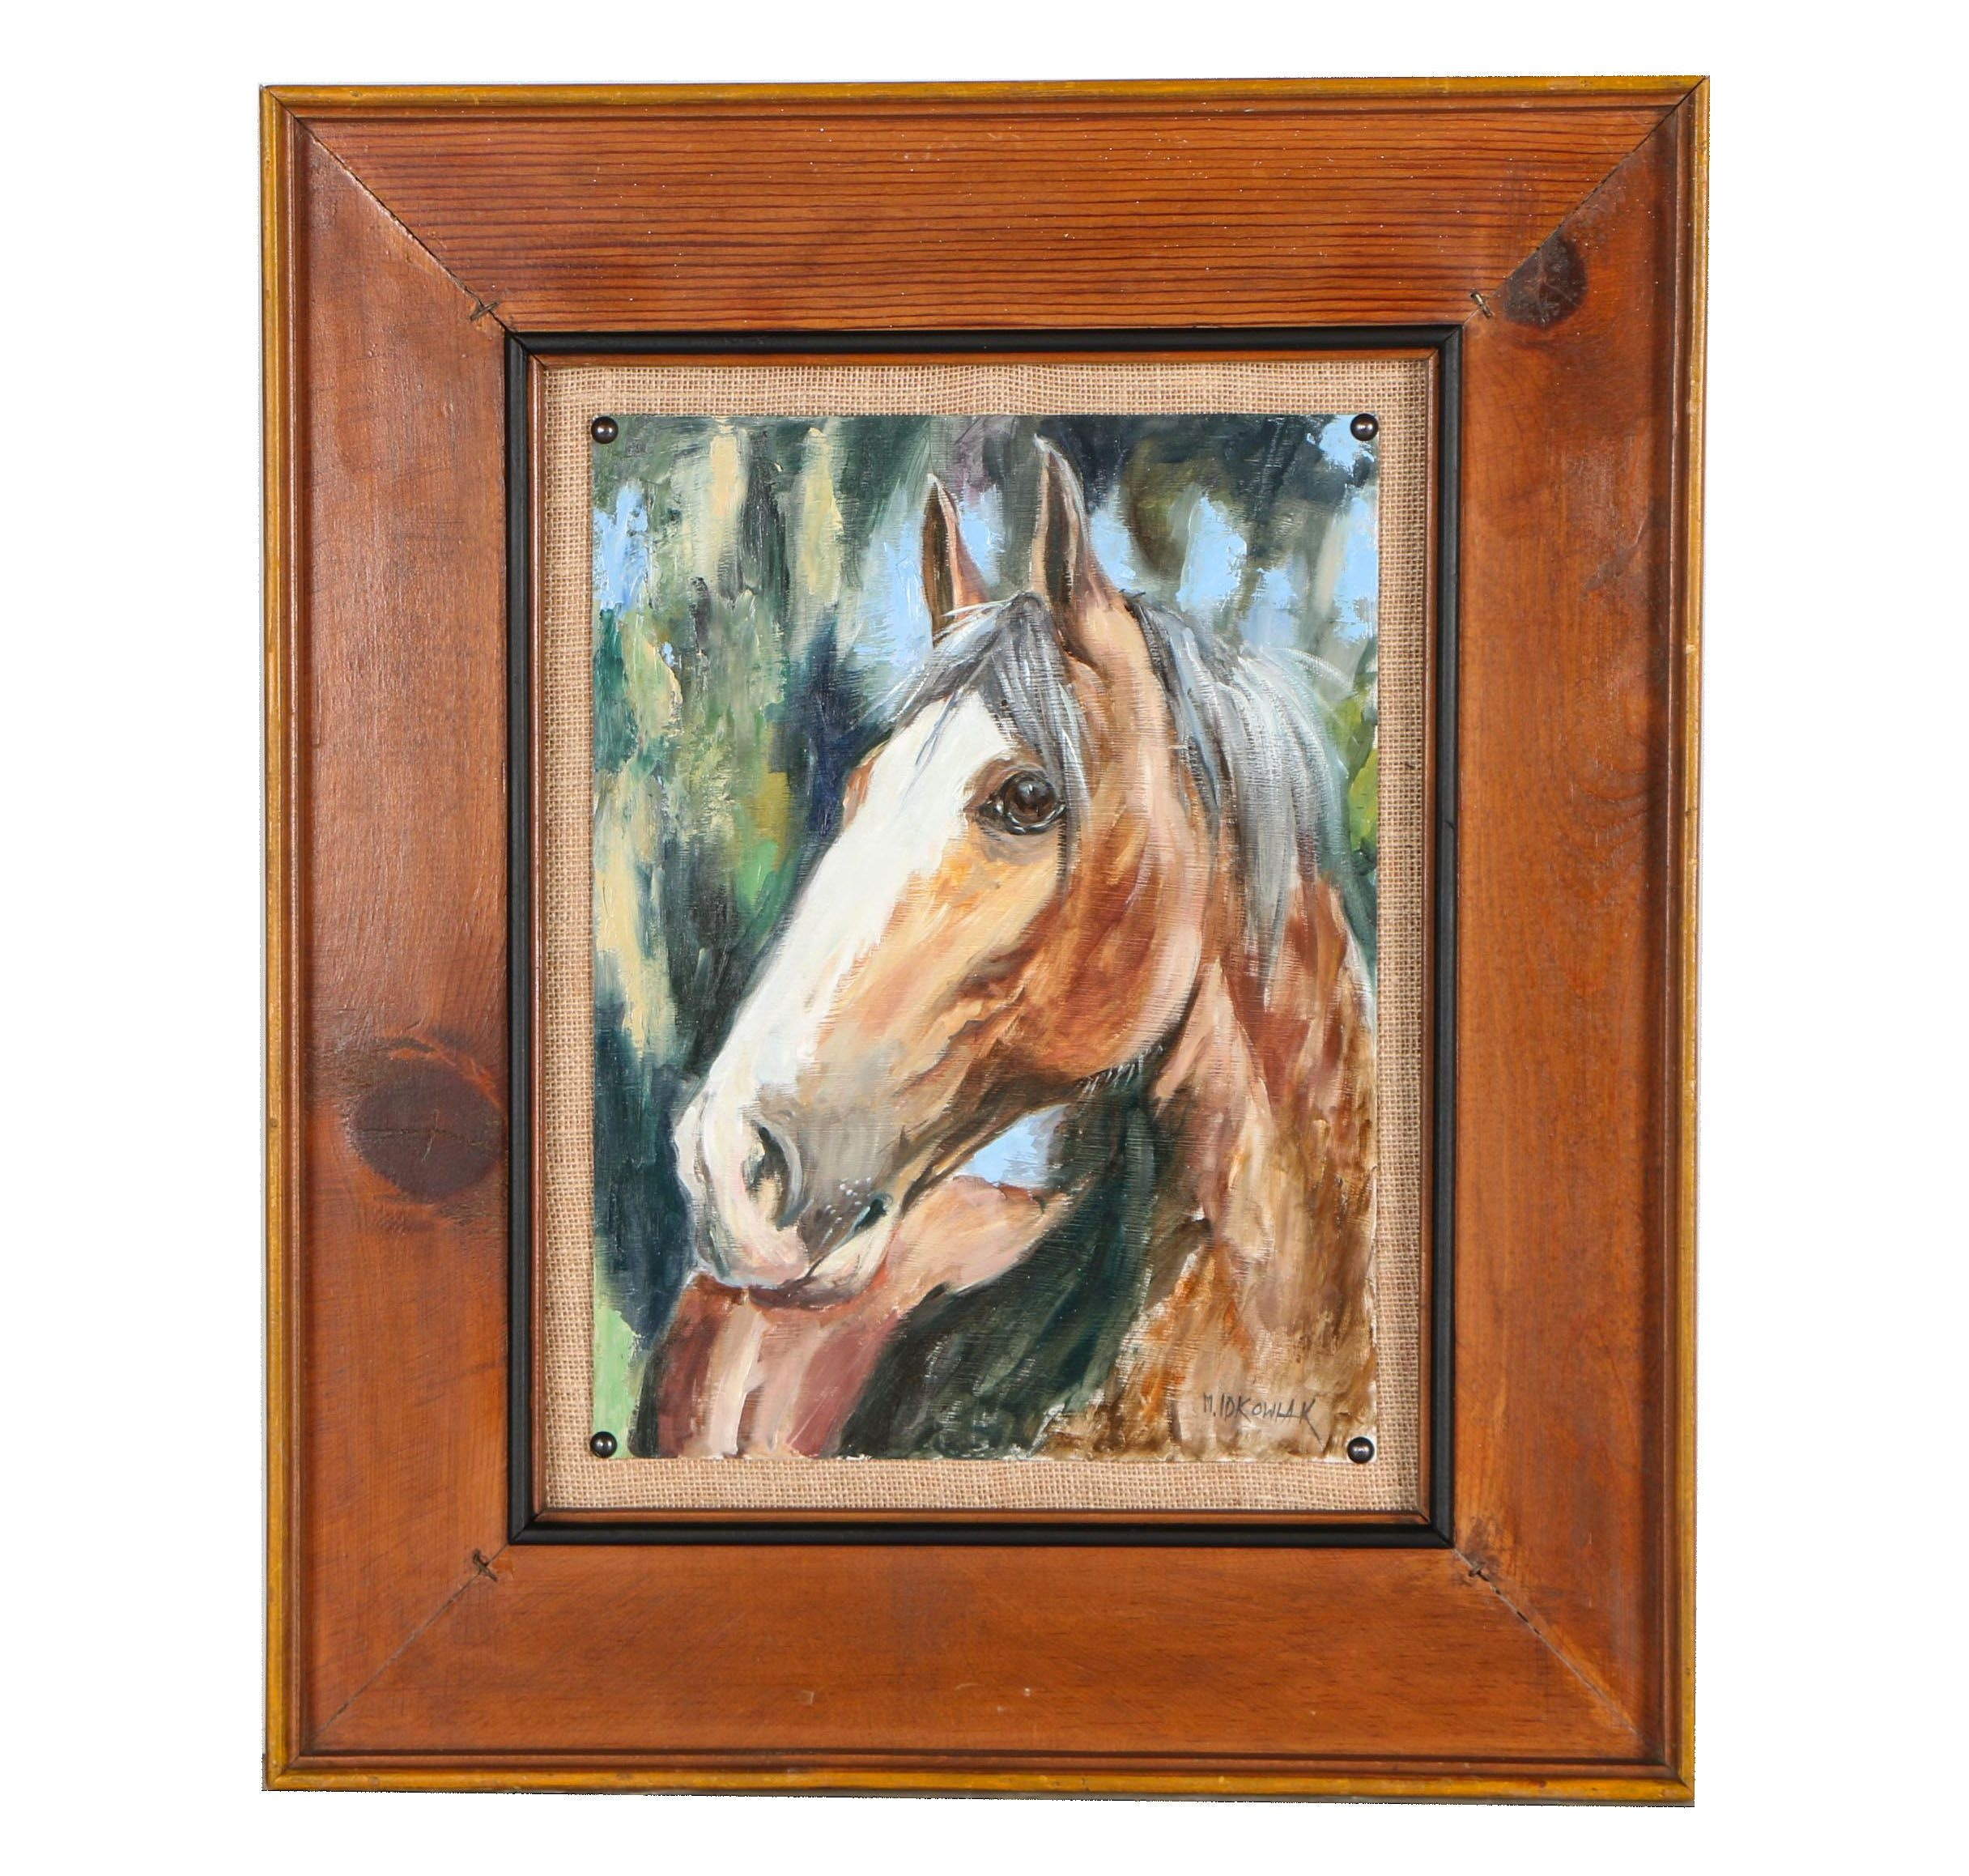 Mario Idkowiak Oil Painting of Horse